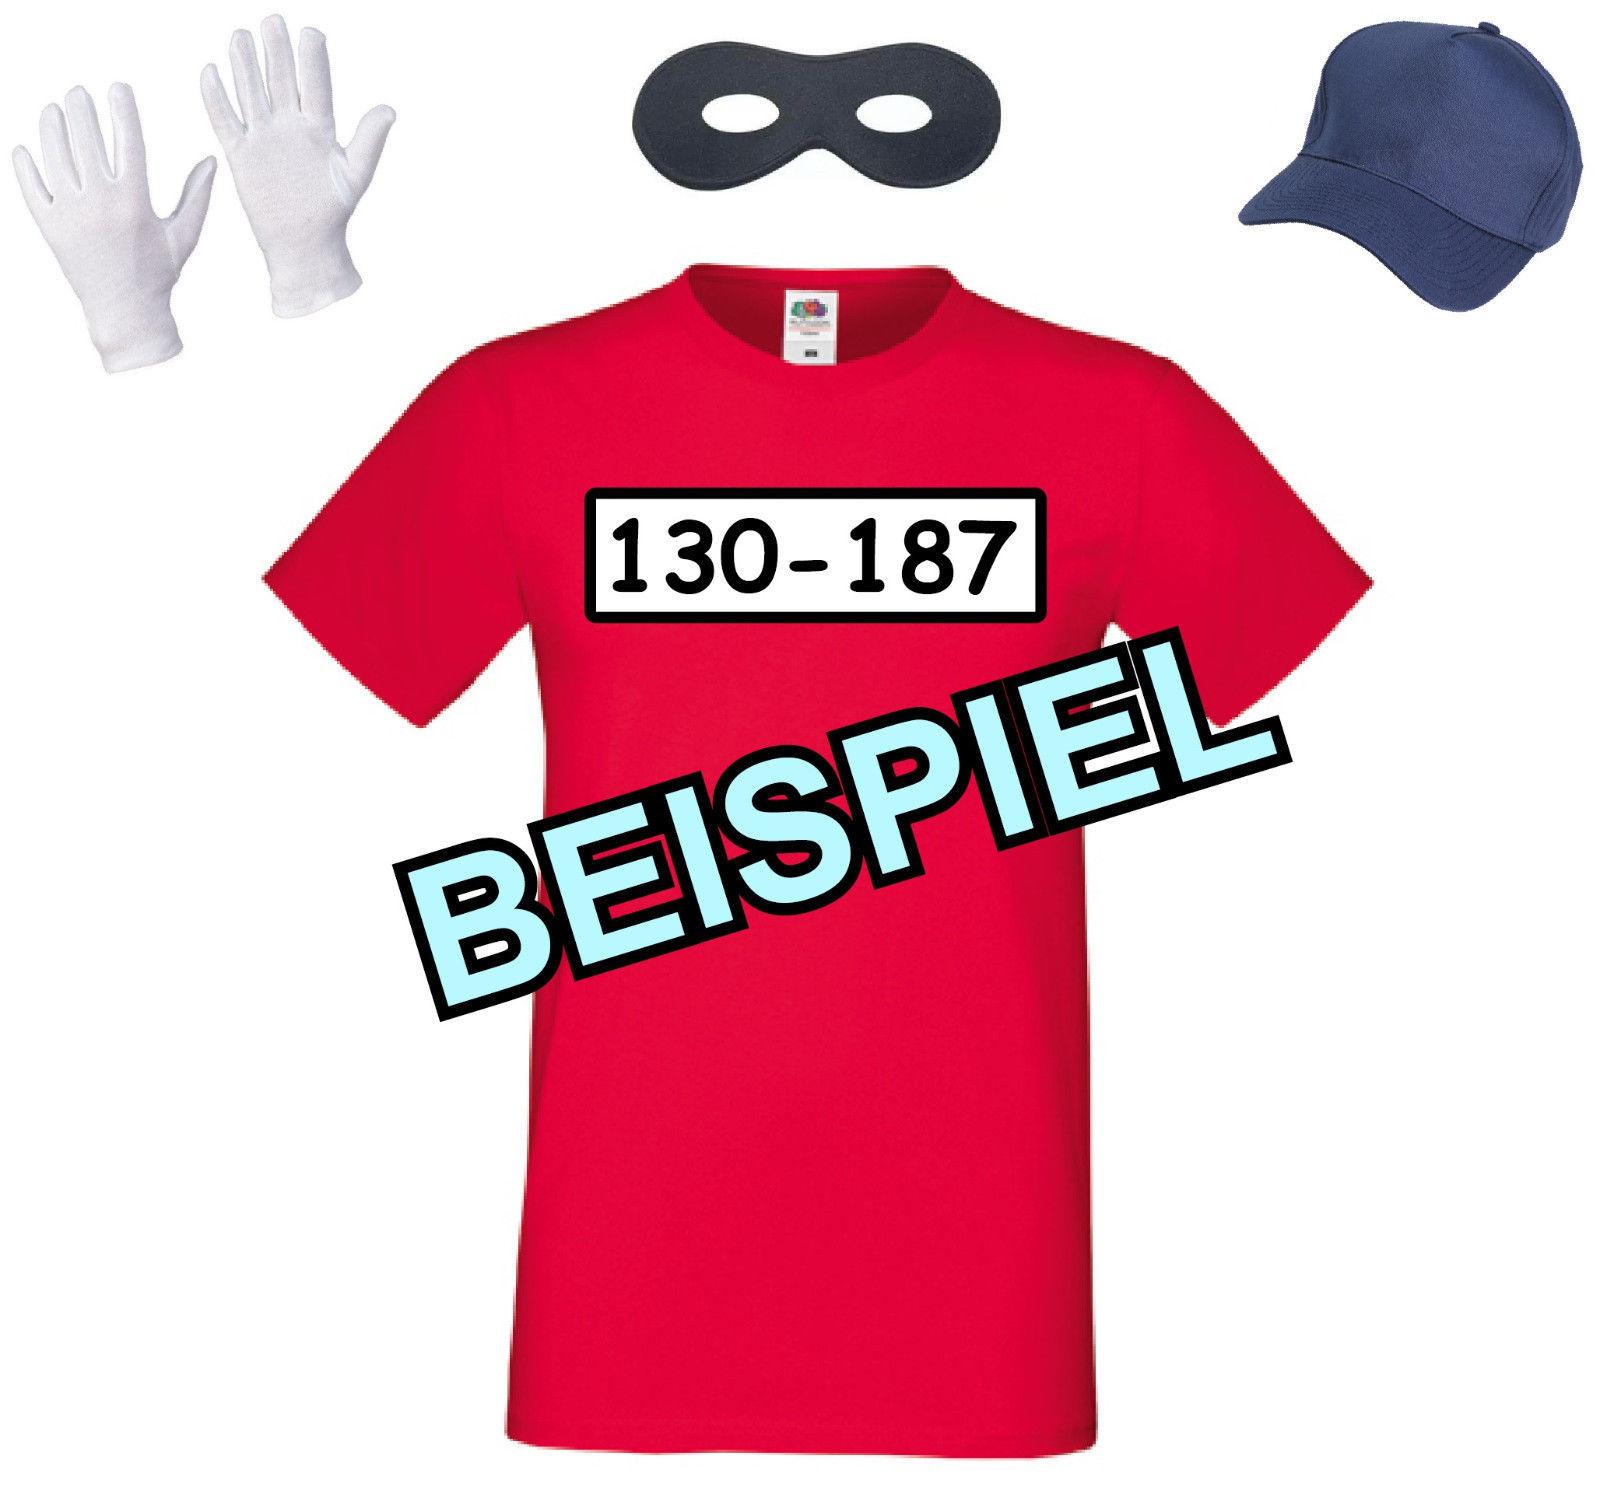 panzerknacker t shirt karnevalskost m karneval kost m verkleidung fasching jga ebay. Black Bedroom Furniture Sets. Home Design Ideas